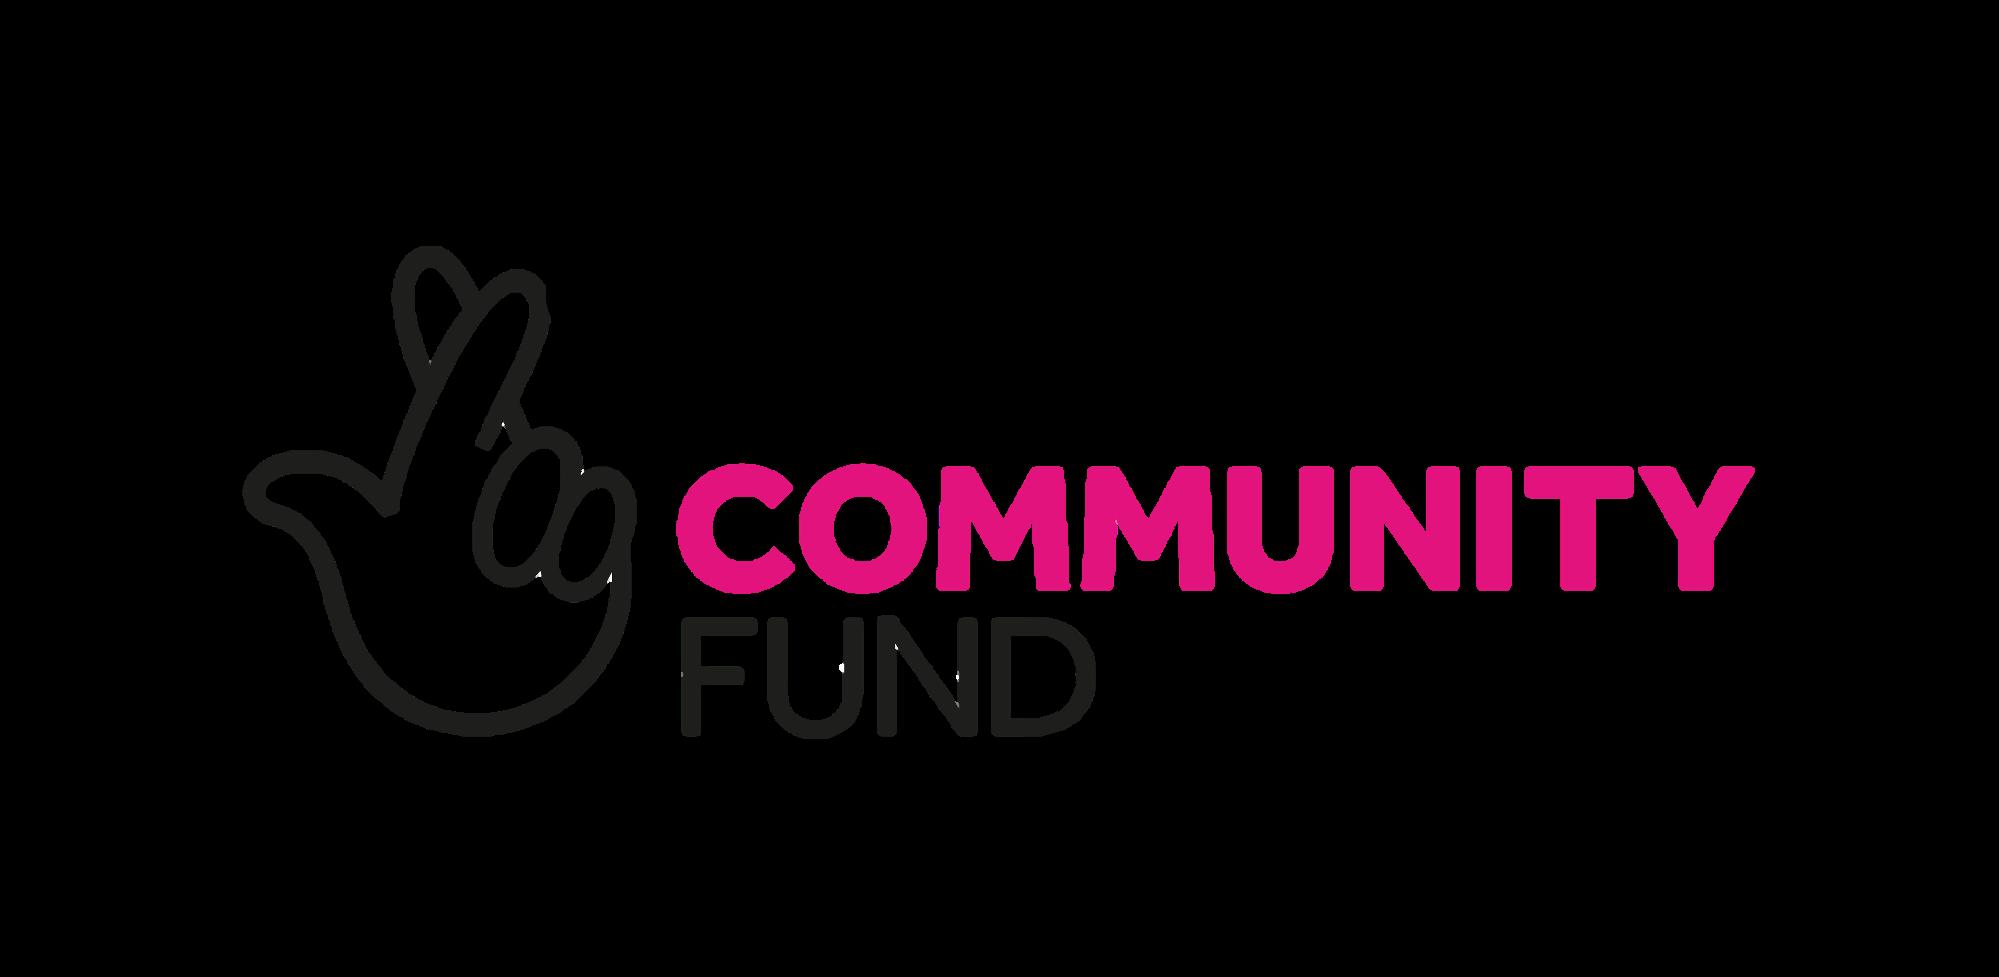 Lotto Community Fund